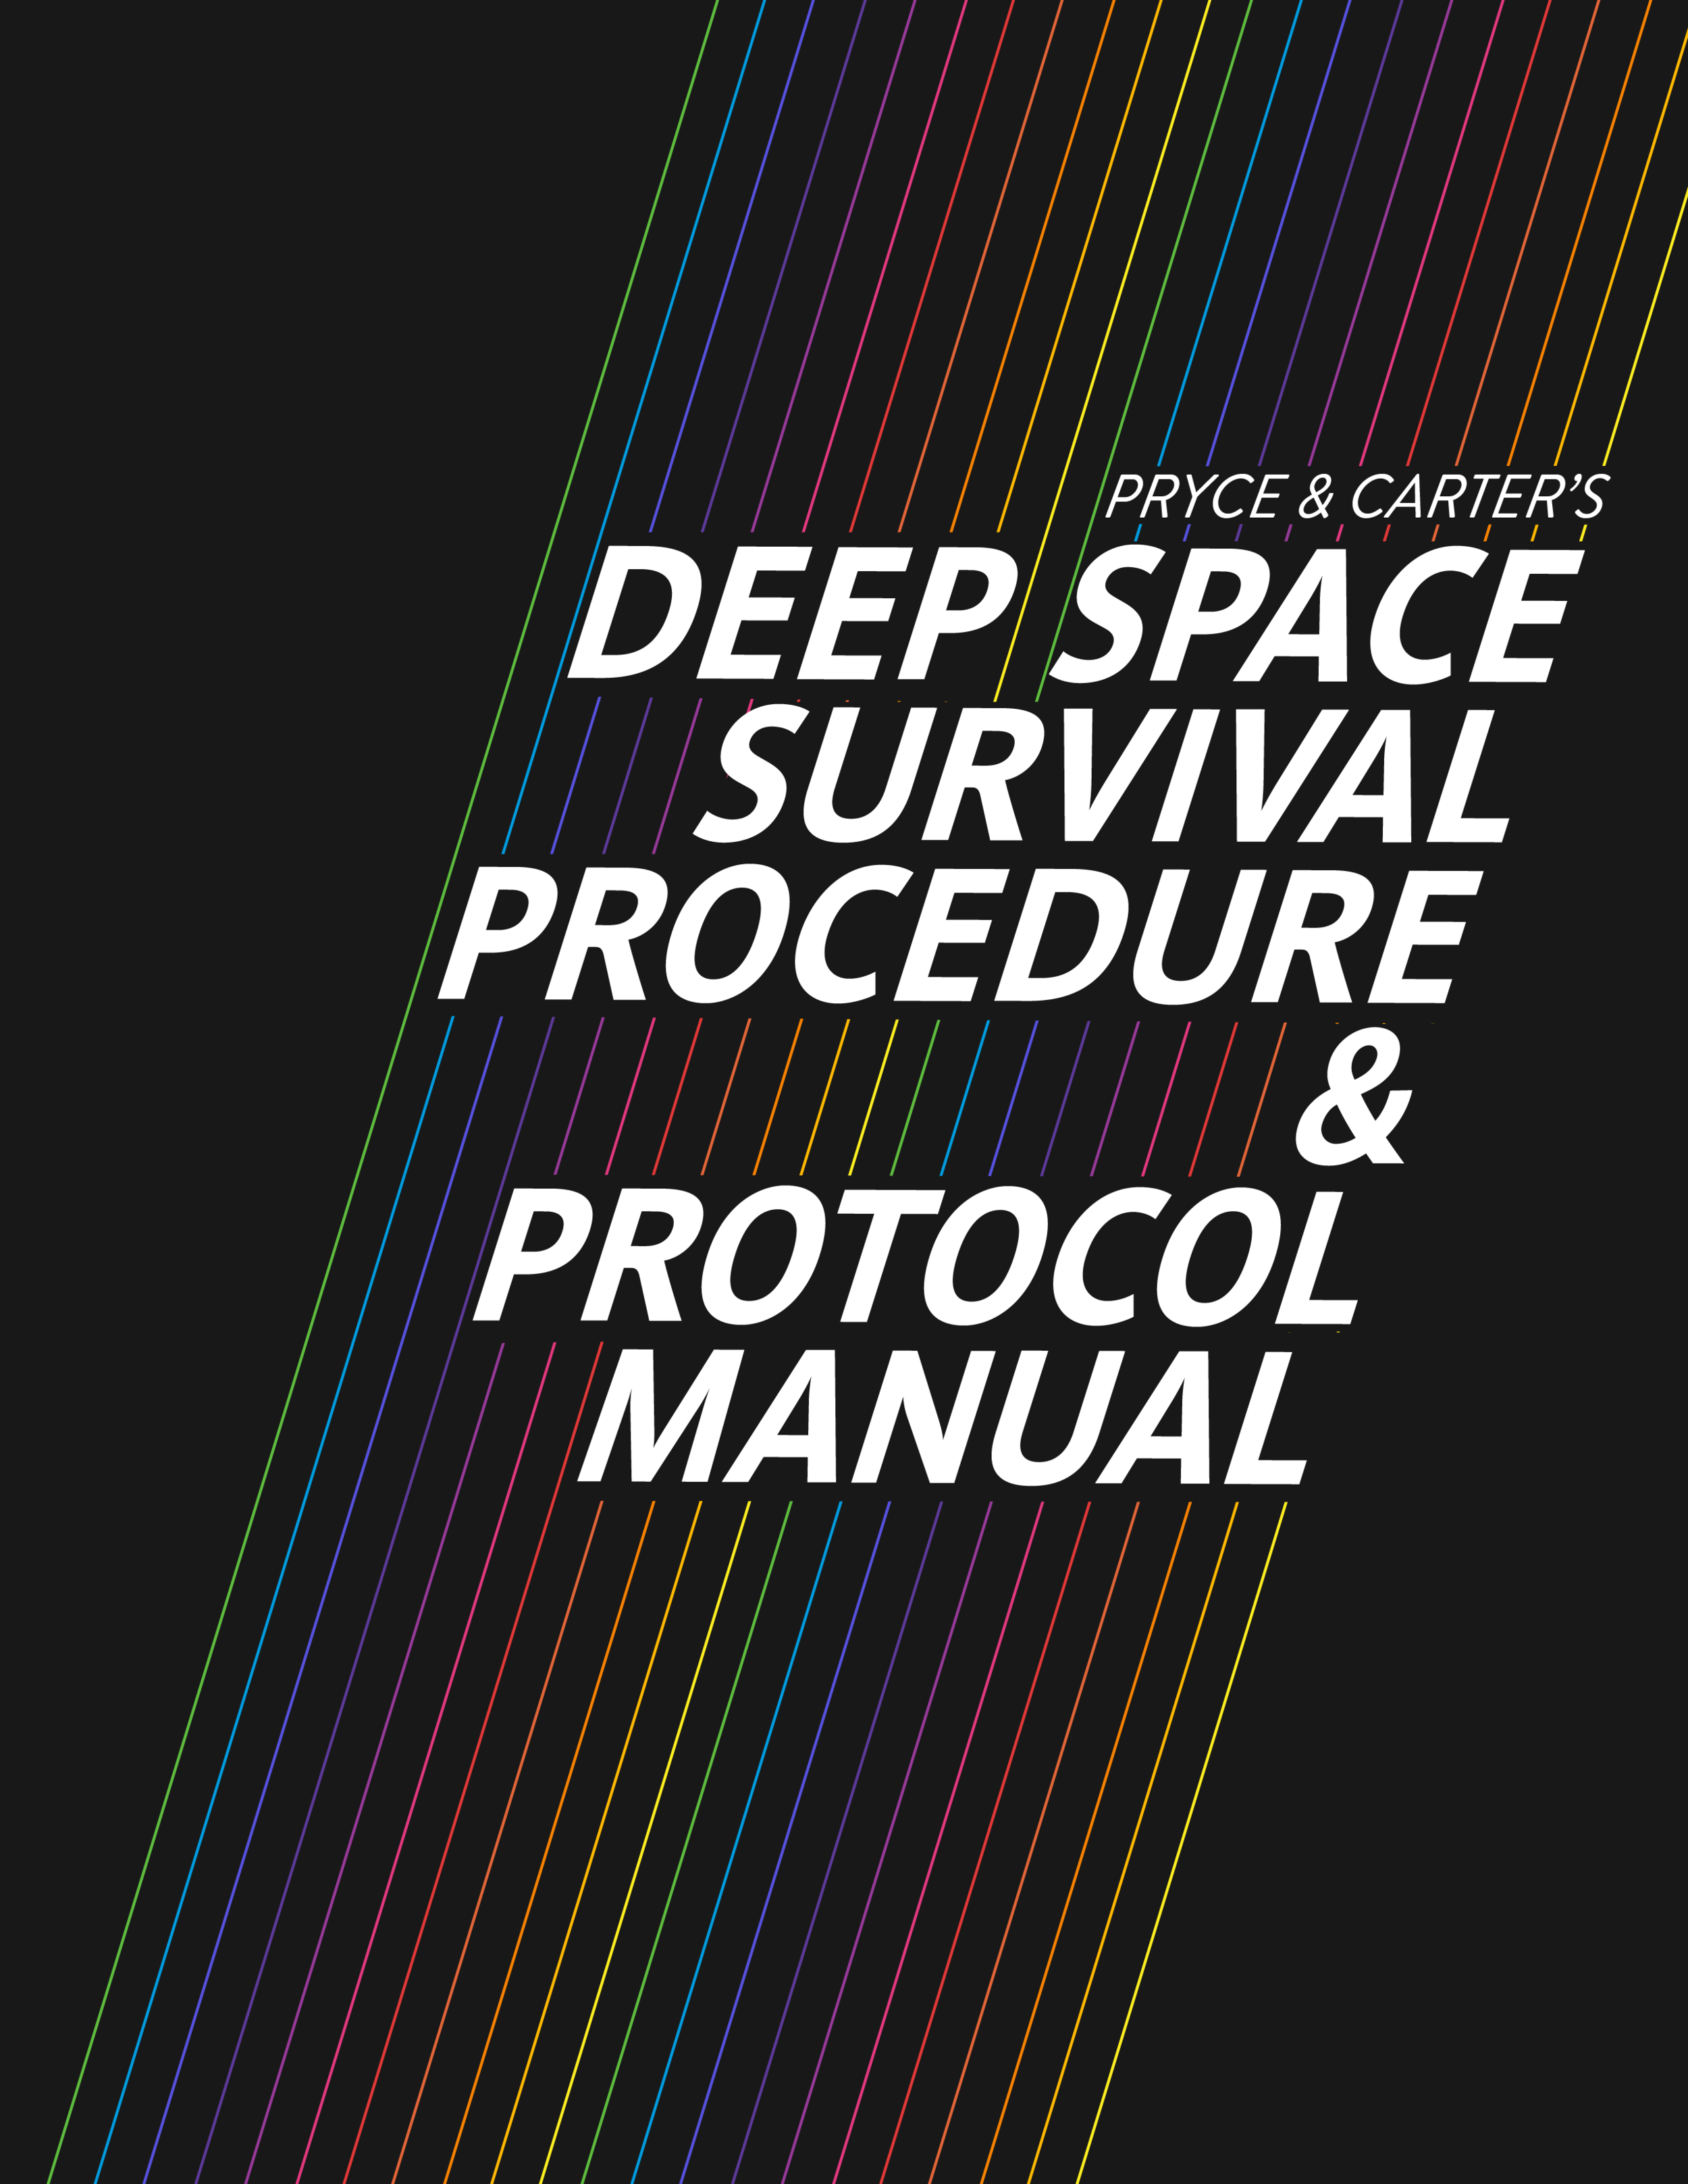 DEEP SPACE MANUAL-01.PNG